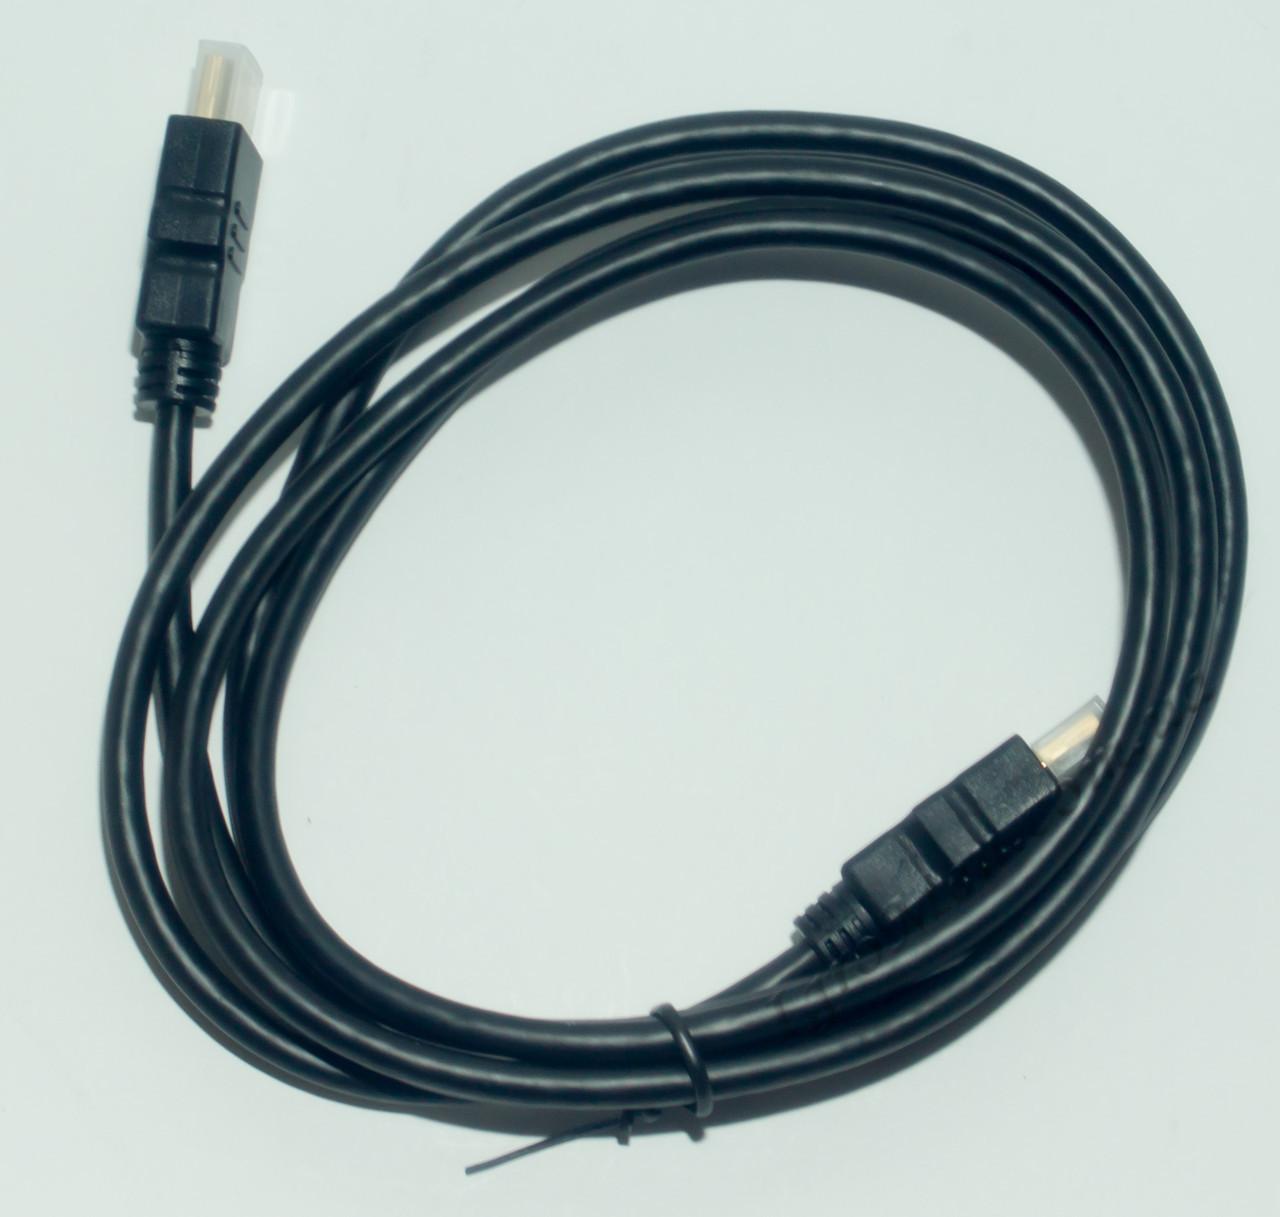 Замена видеокабеля Денди HDMI (5 м)